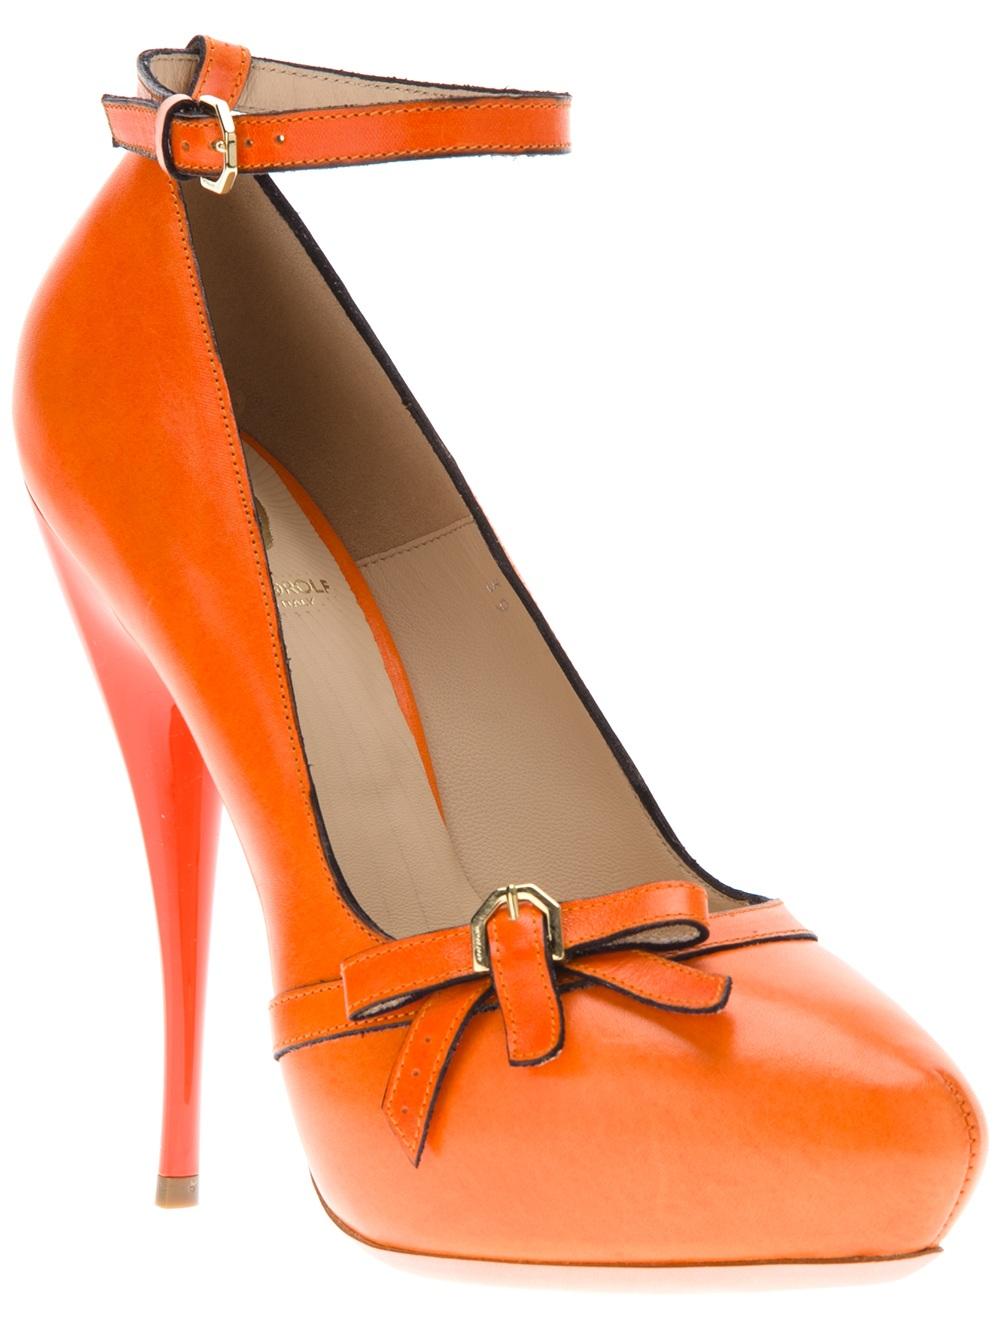 Orange High Heel Shoes Ireland